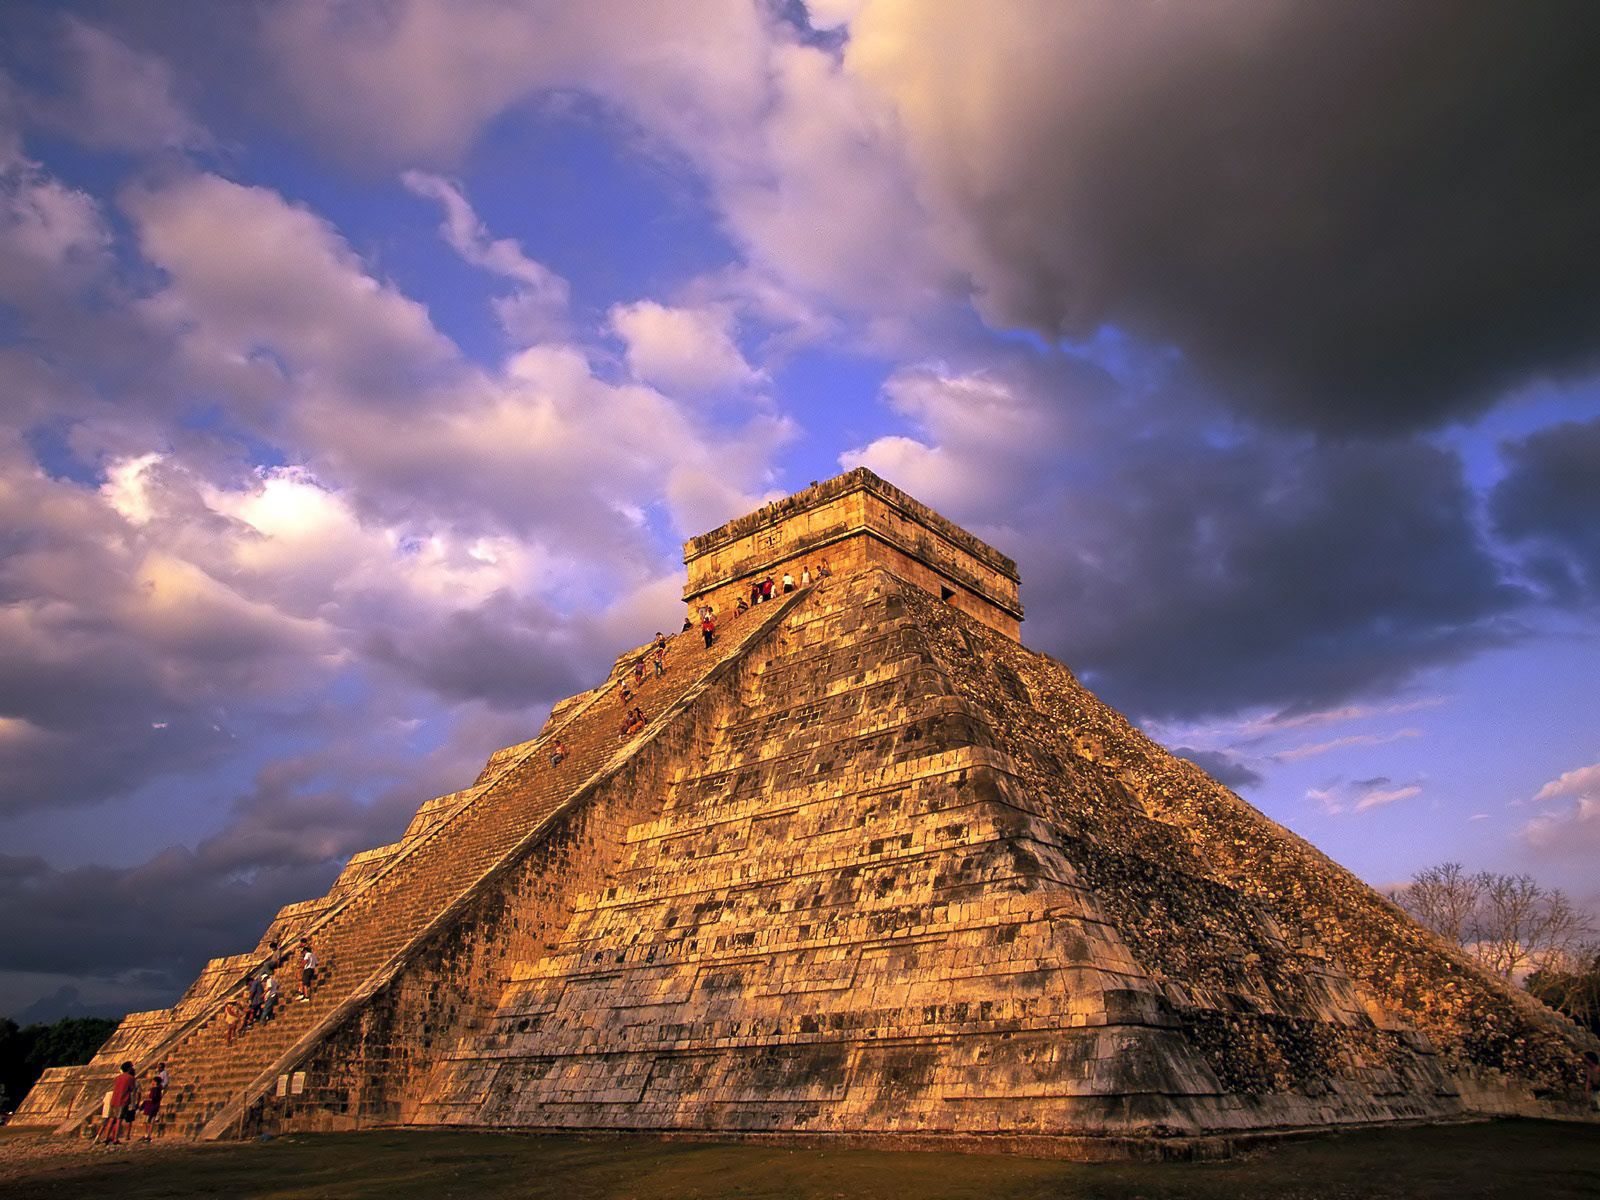 Mexico Mayan Pyramid hd Wallpaper High Quality WallpapersWallpaper 1600x1200